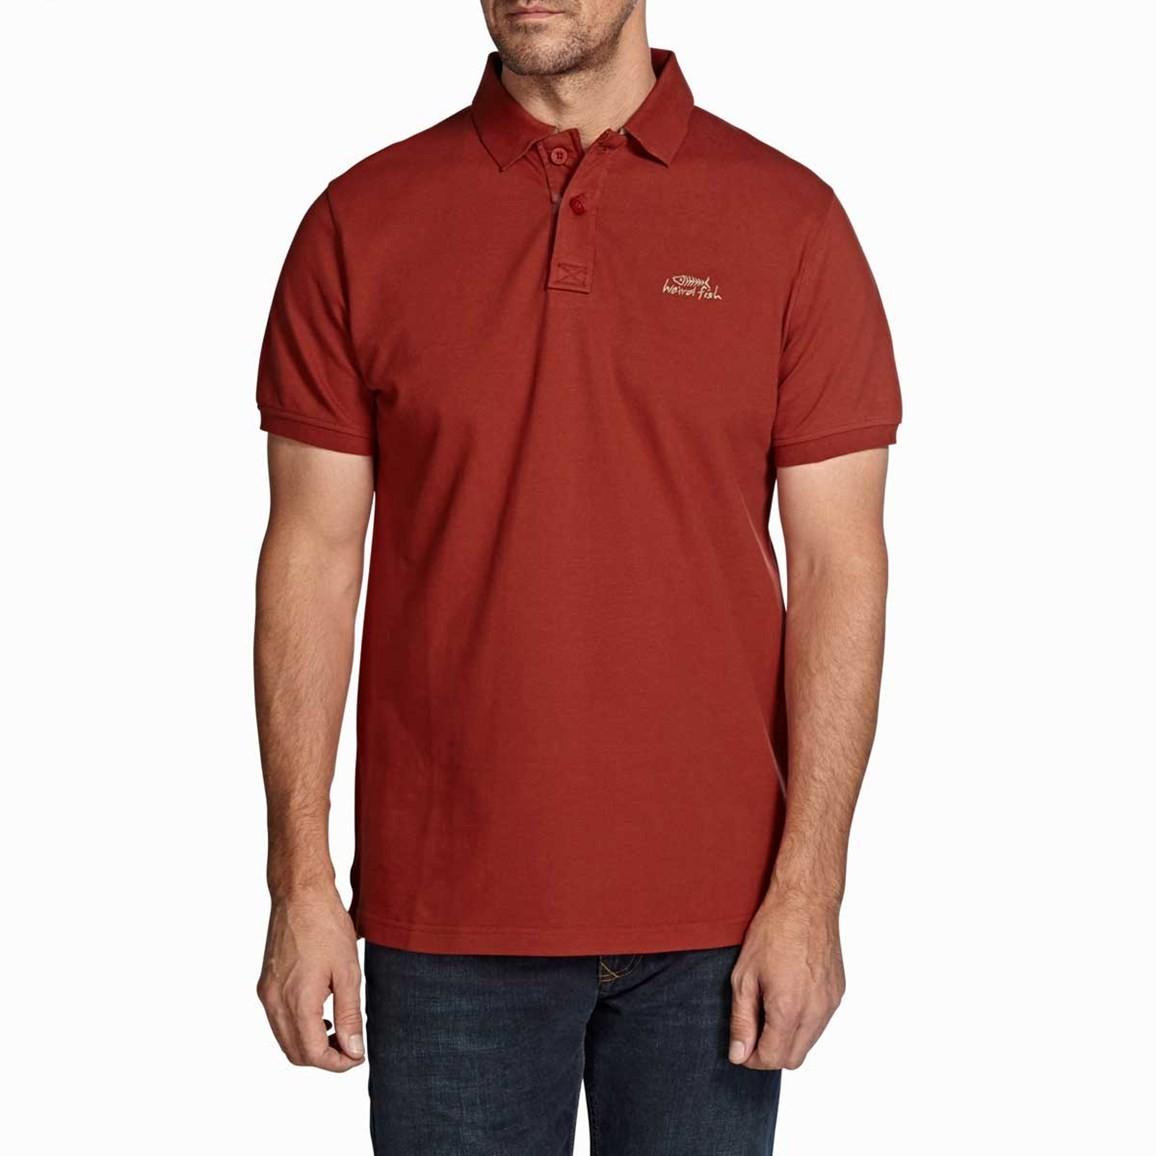 Barros Classic Pique Polo Shirt Chilli Red